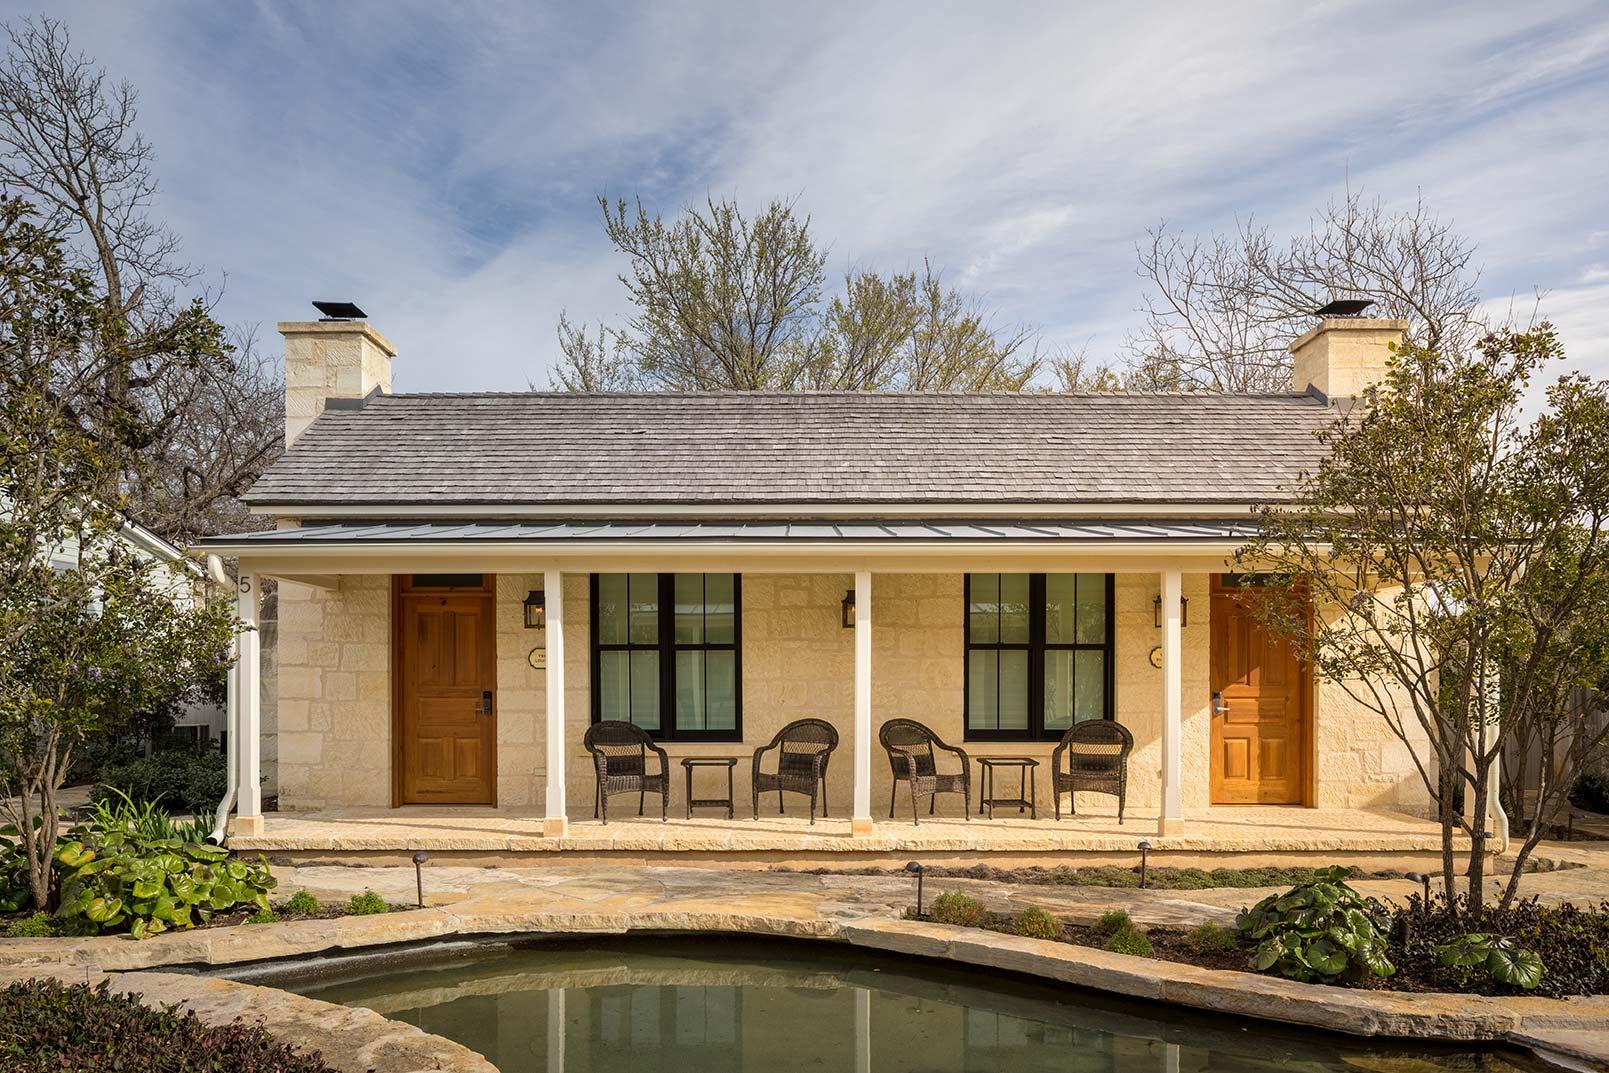 blacksmith-quarters-fredericksburg-realty-texas-hill-country-cabins.jpg